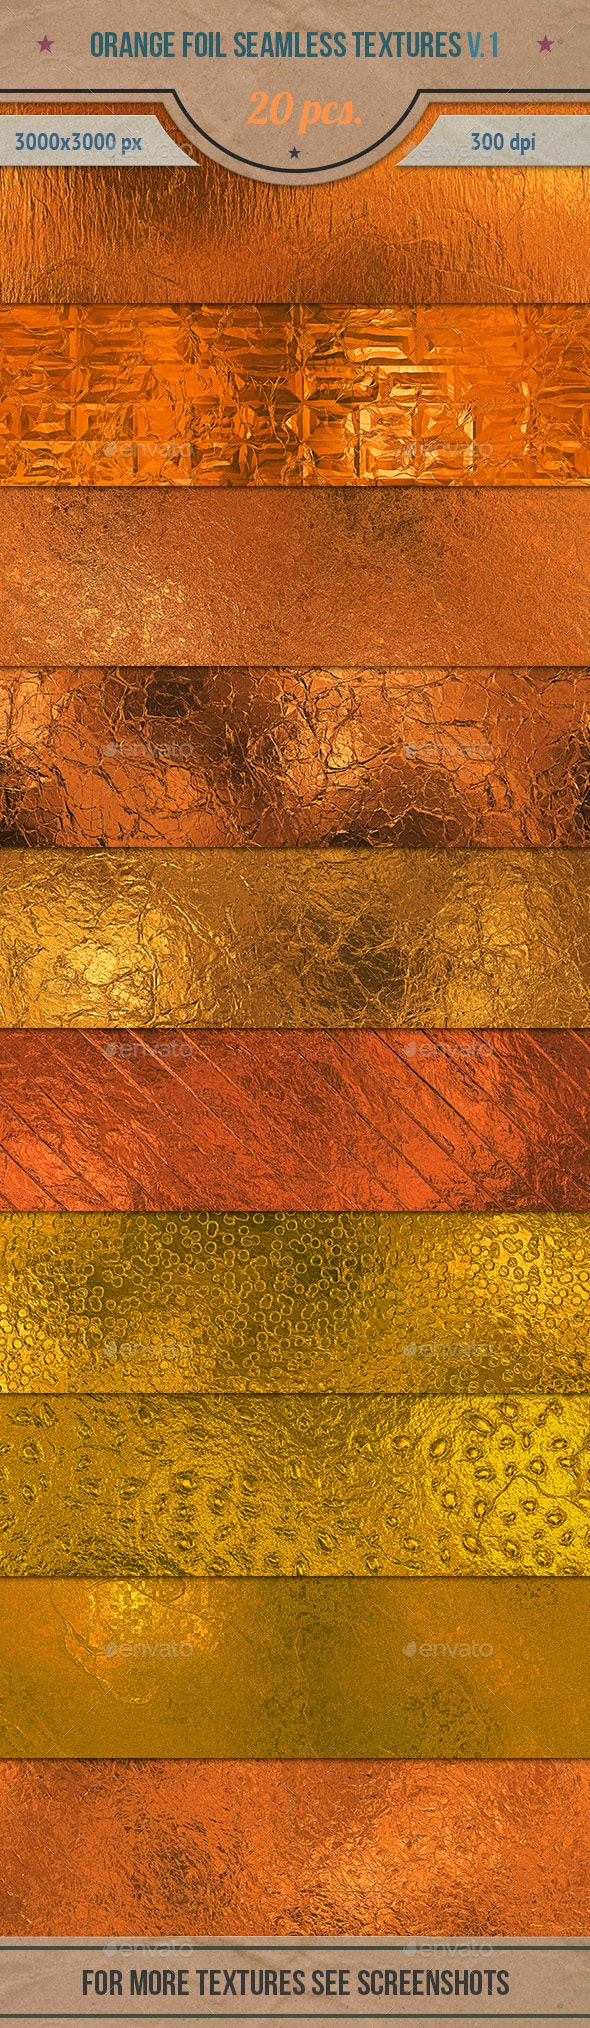 Orange Foil Tileable Textures Pack v.1 - Textures